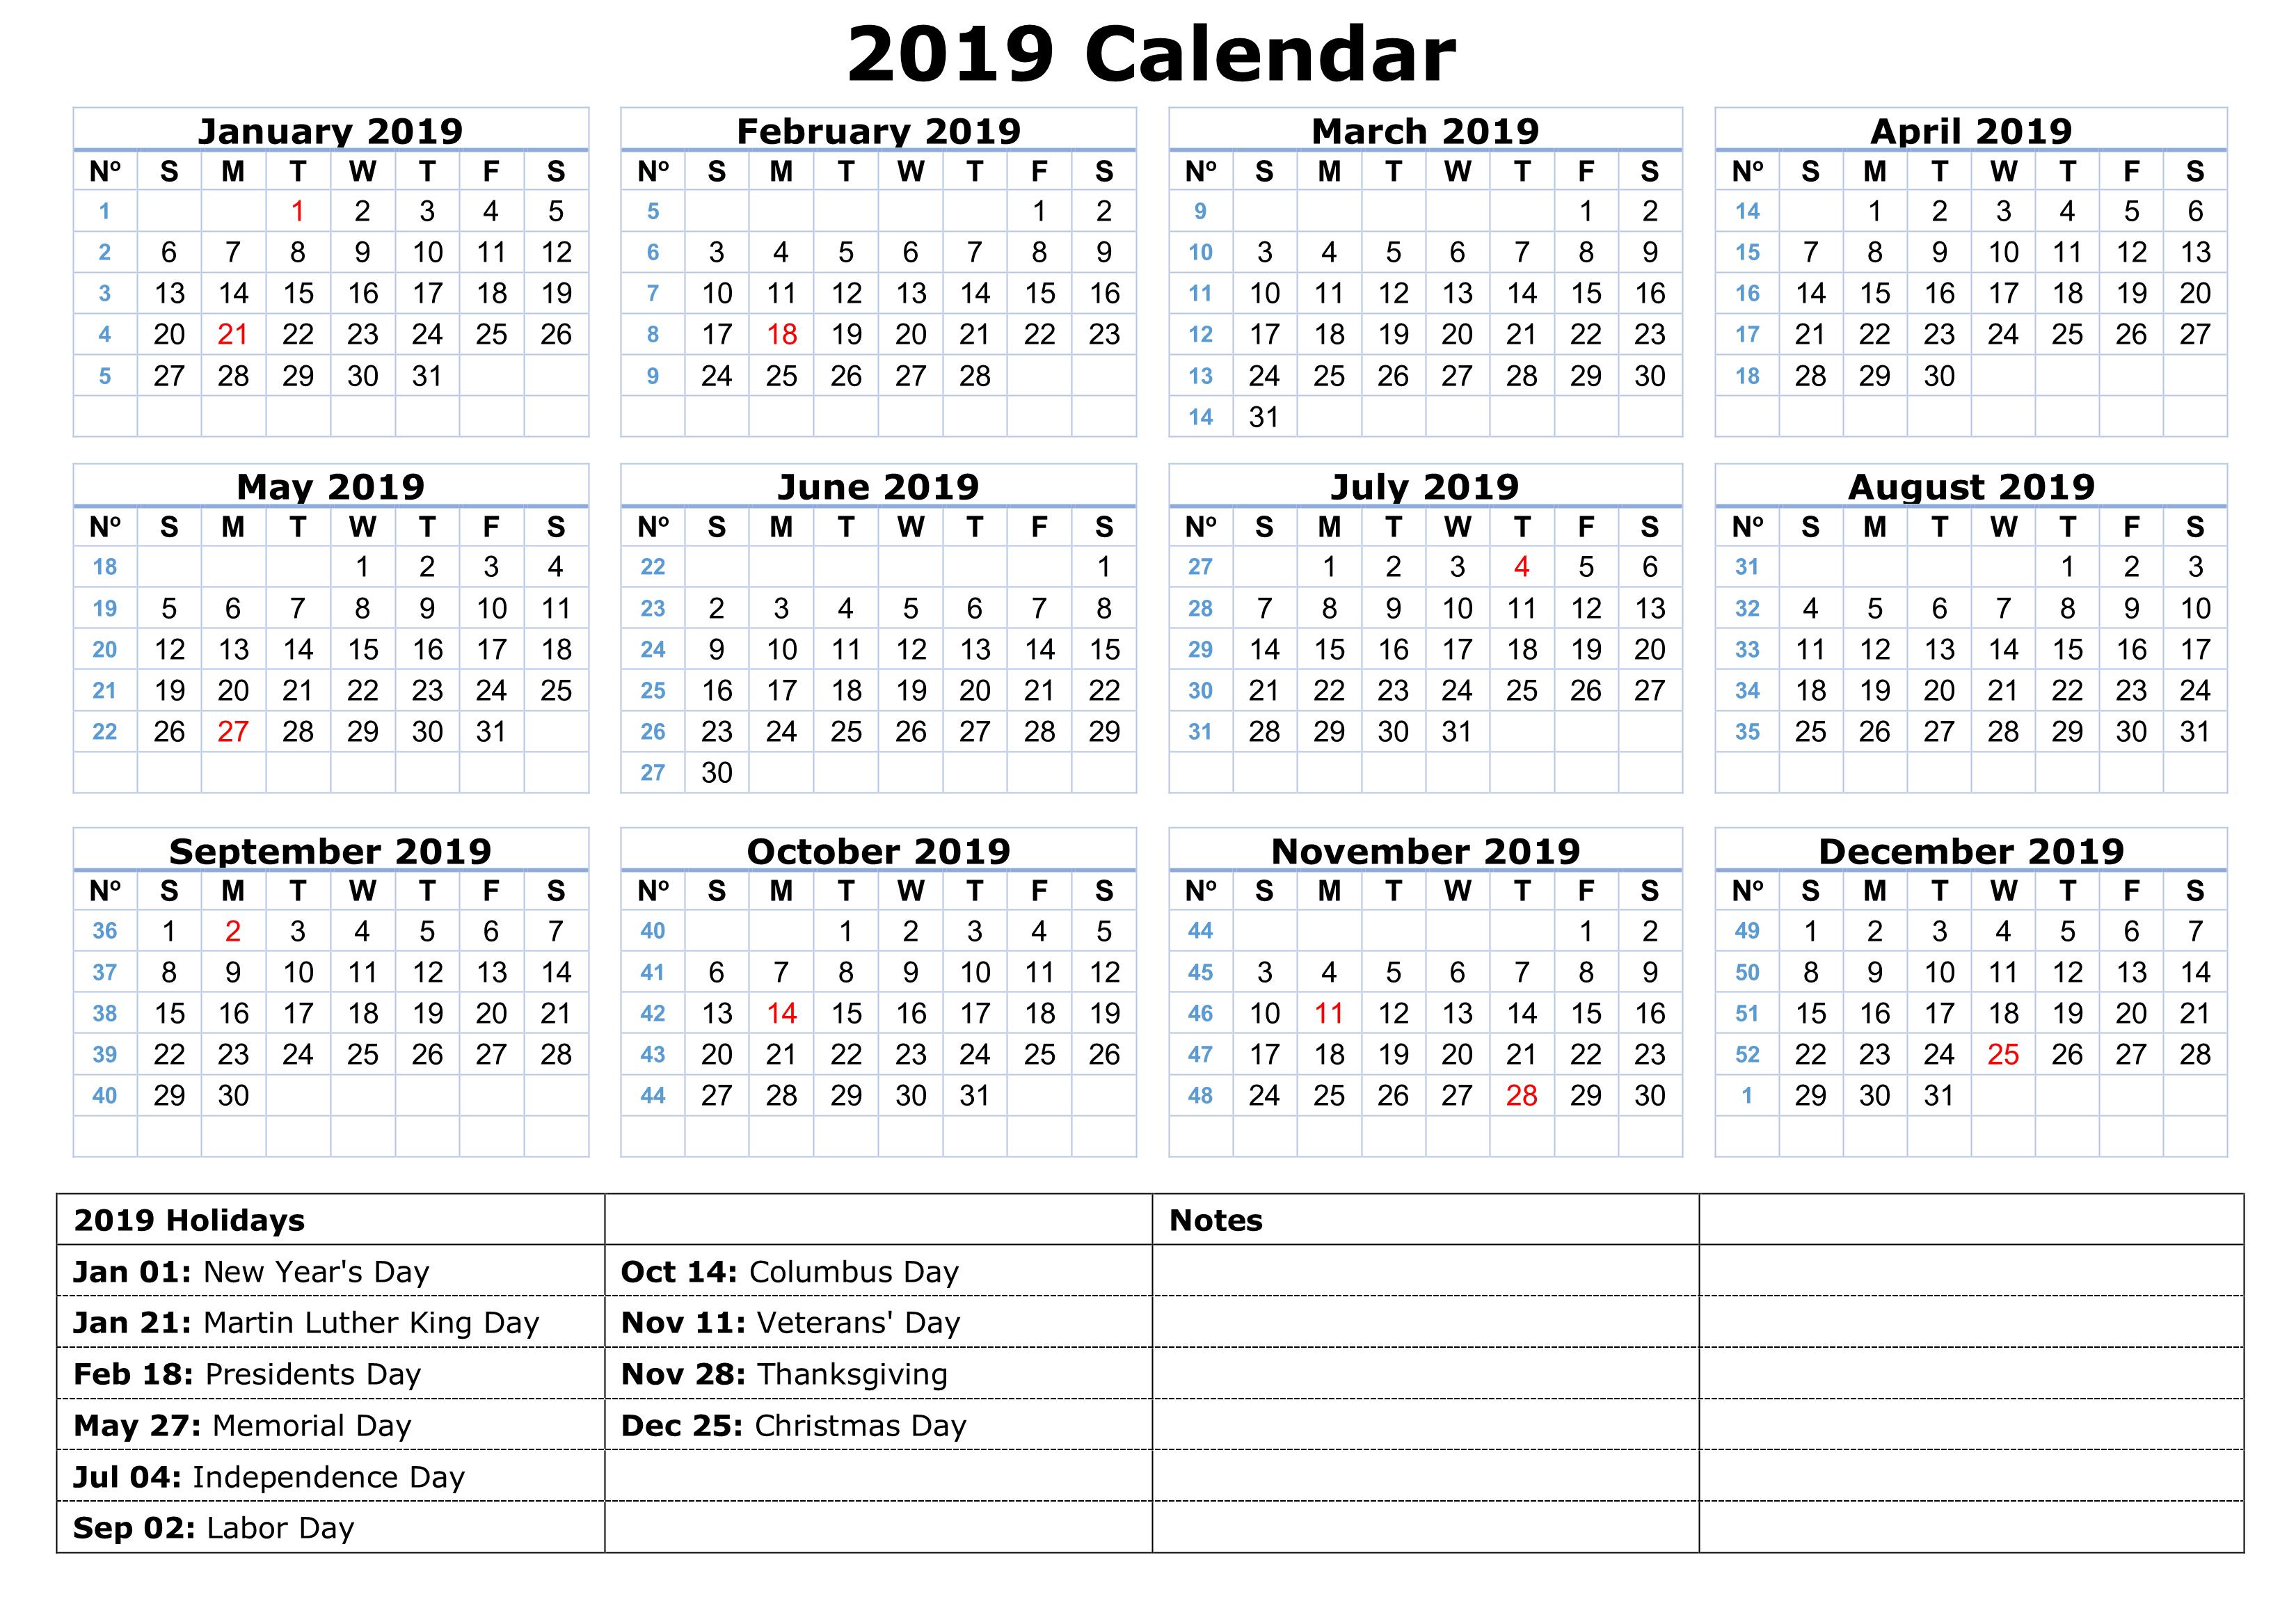 Happy New Year Calendar 2019